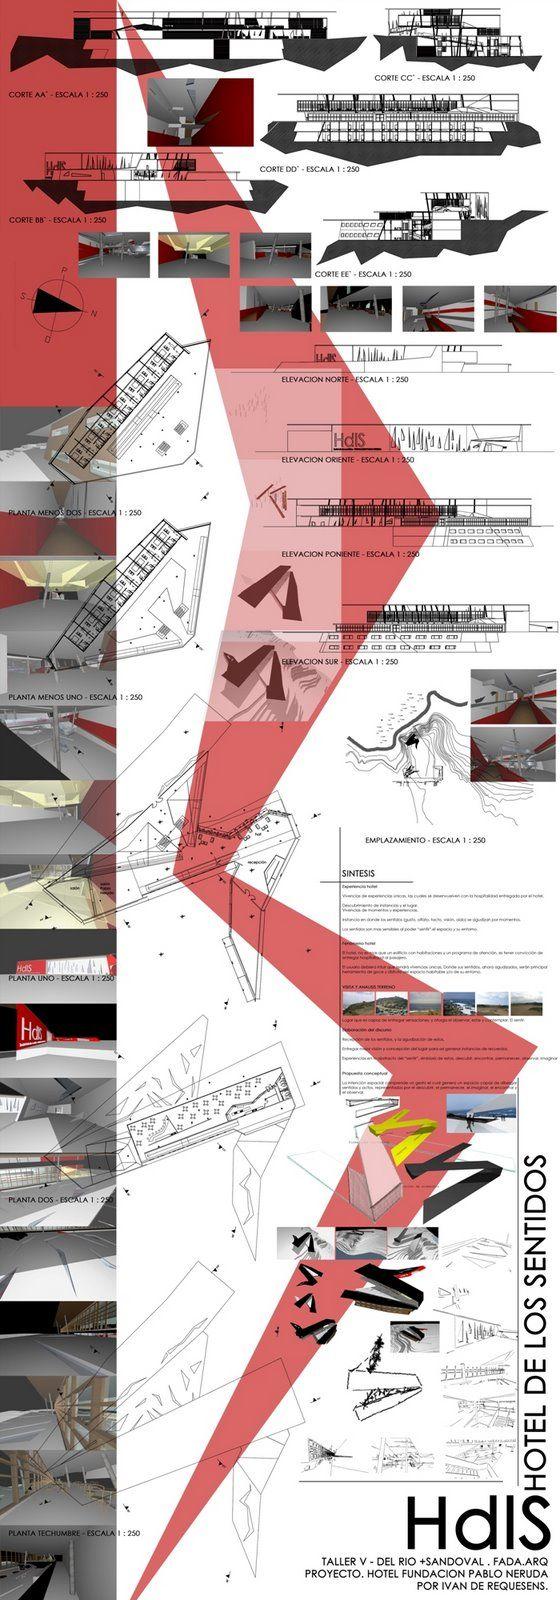 Paneles de Arquitectura [Armado de láminas] - Taringa!                                                                                                                                                                                 Más